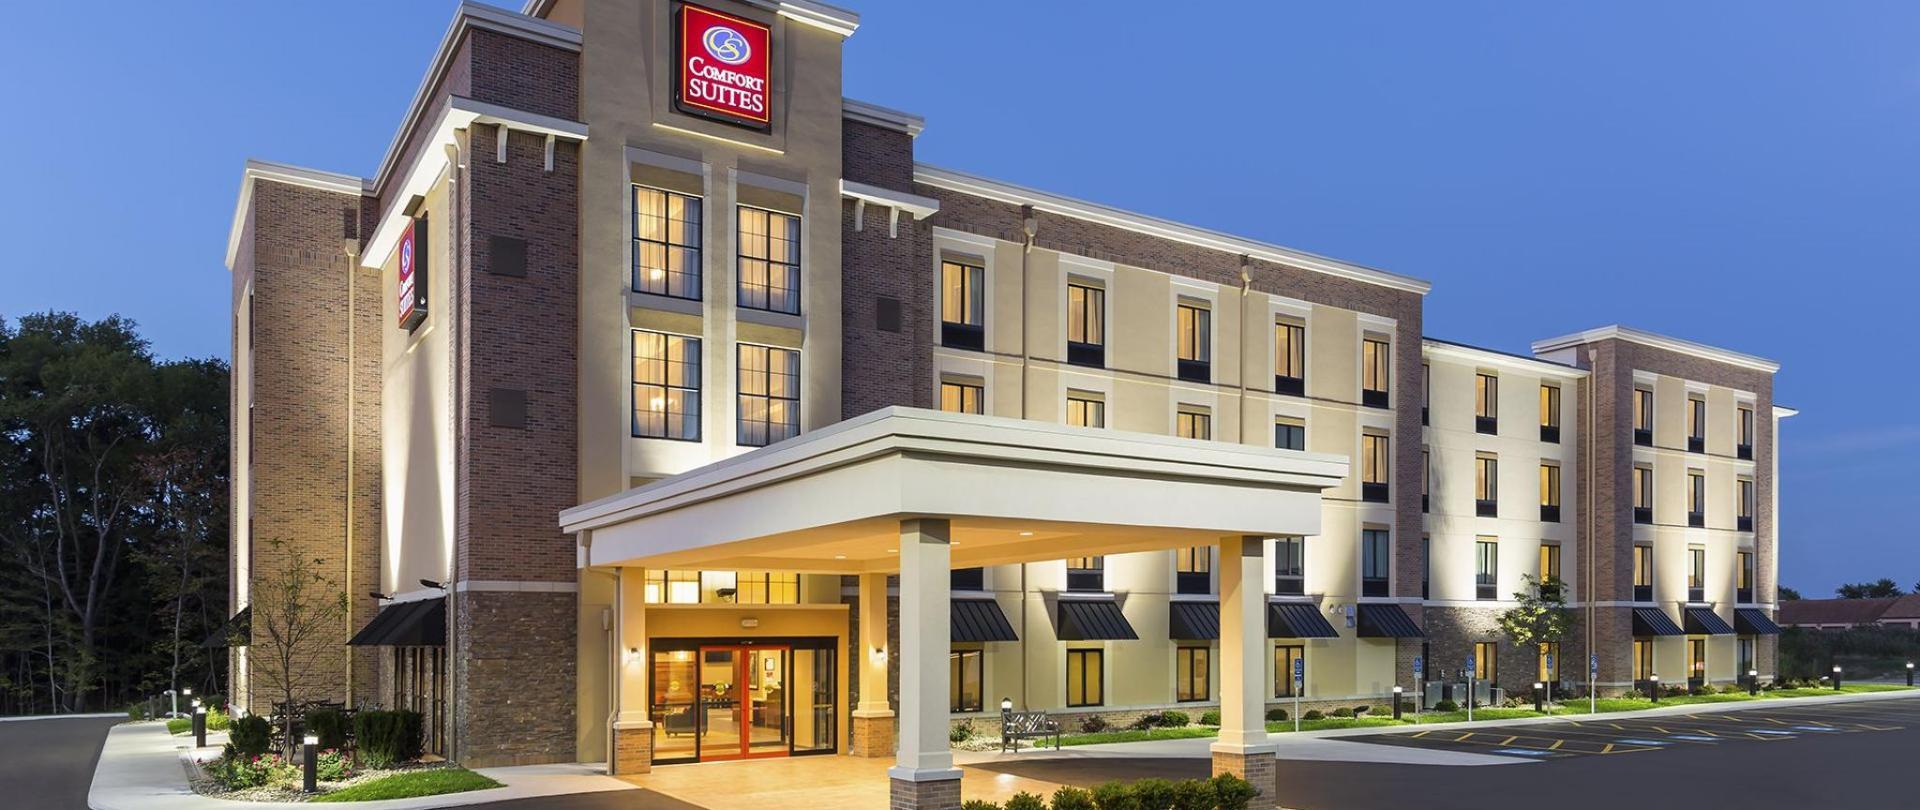 Comfort Suites Hartville OH